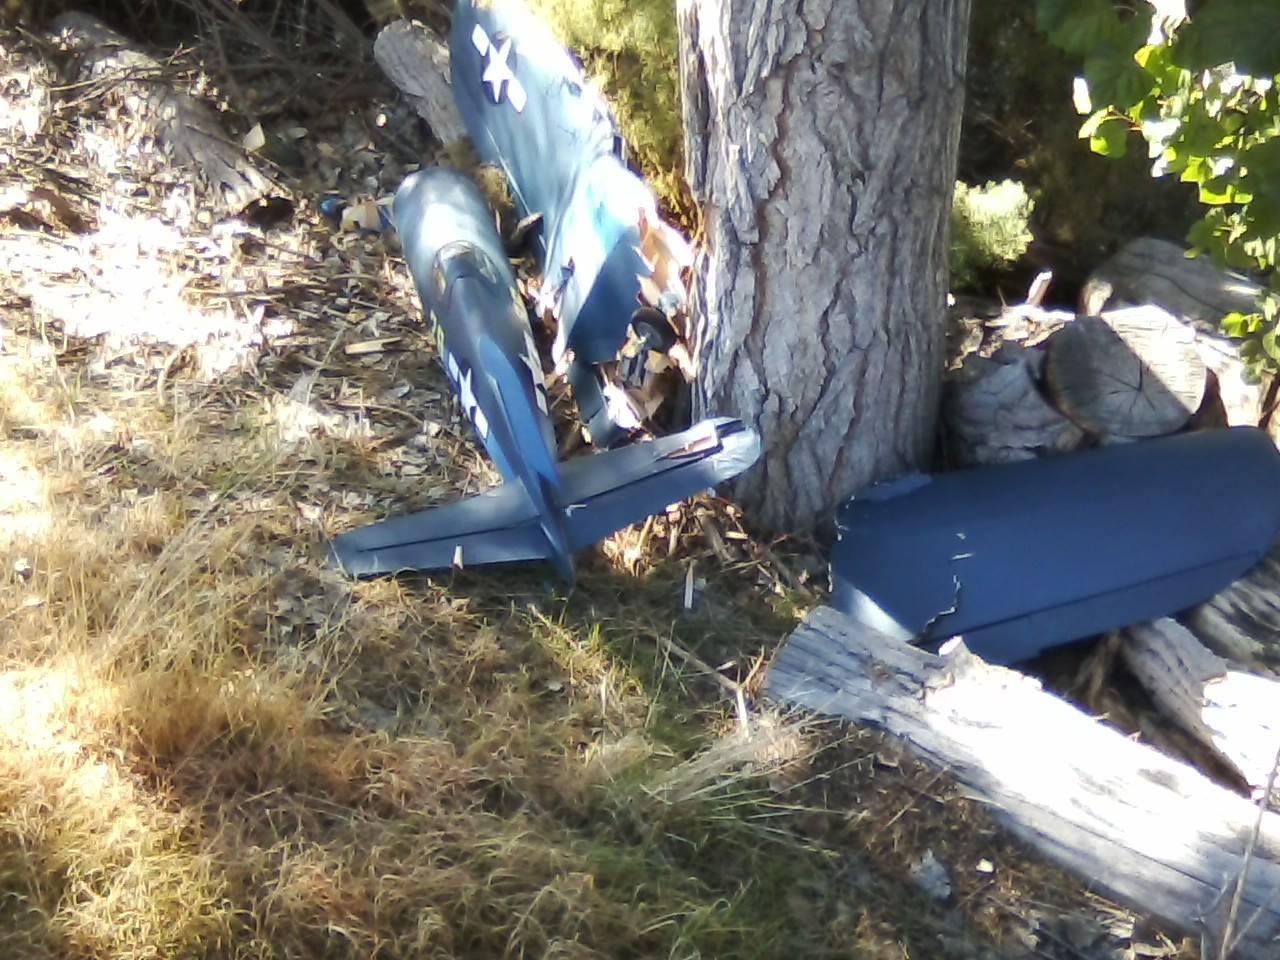 Click image for larger version  Name:corsair crash b.jpg Views:146 Size:188.4 KB ID:2210175